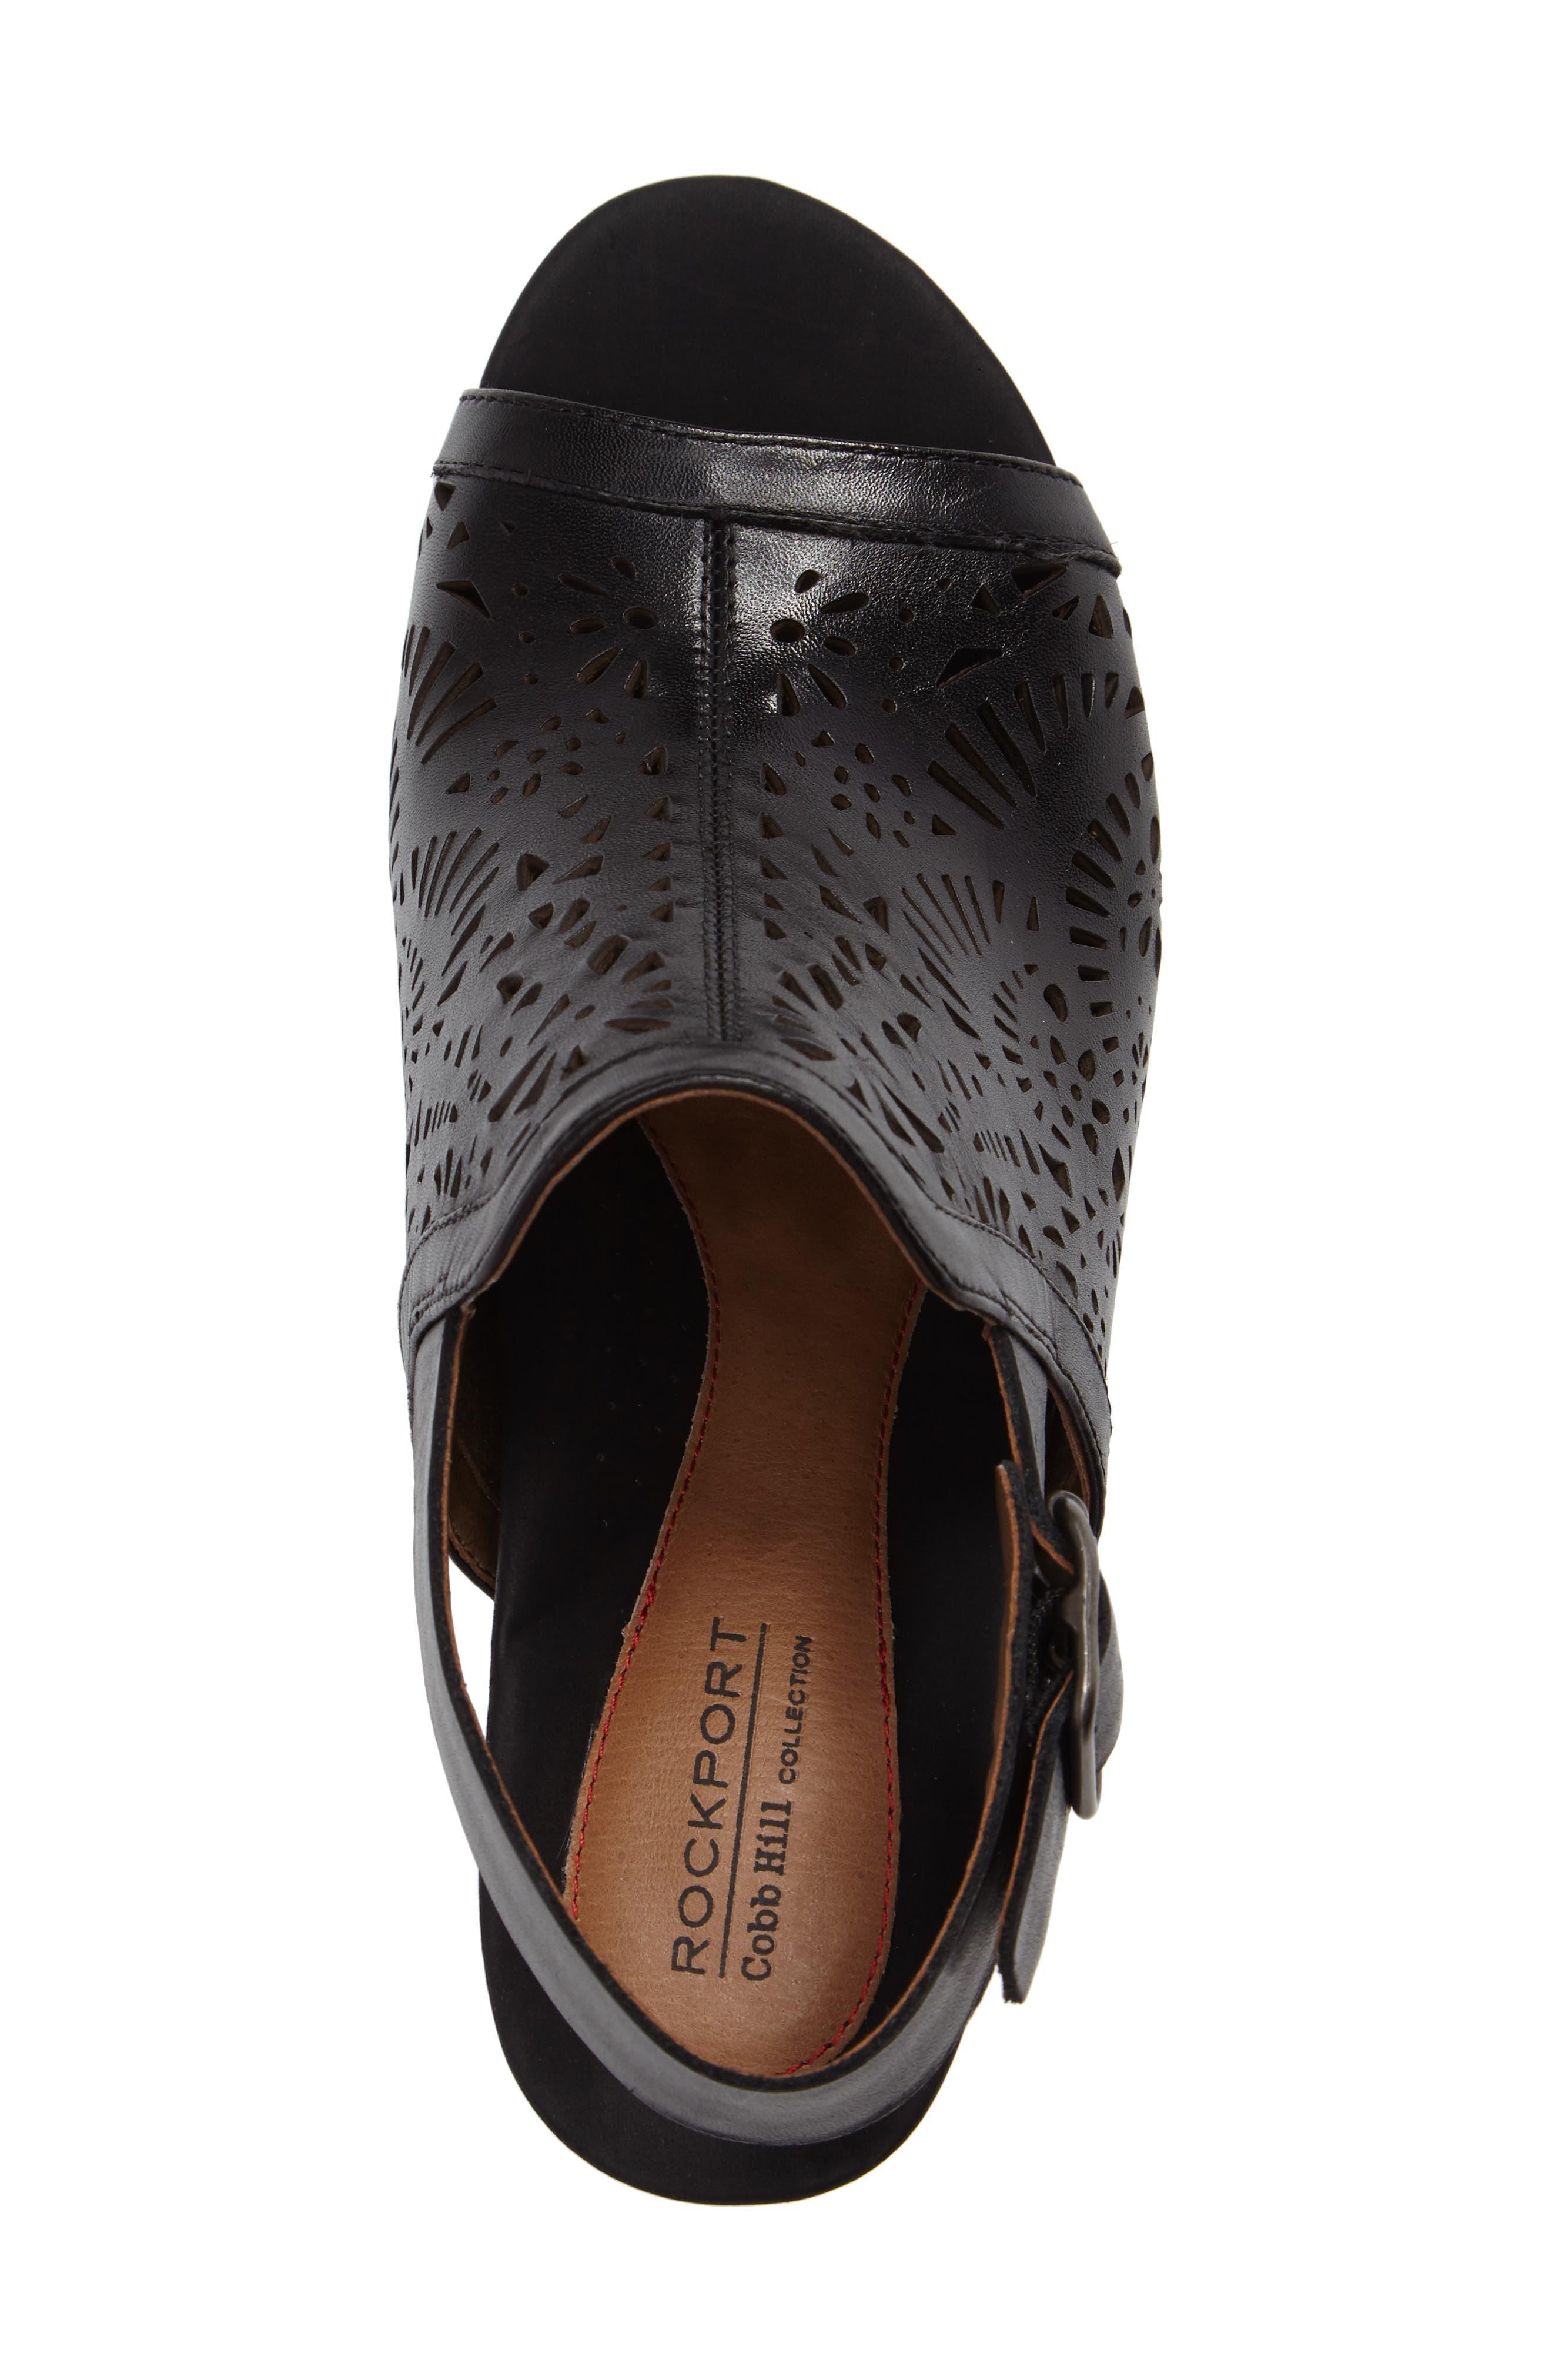 Tropez Block Heel Sandal,                             Alternate thumbnail 17, color,